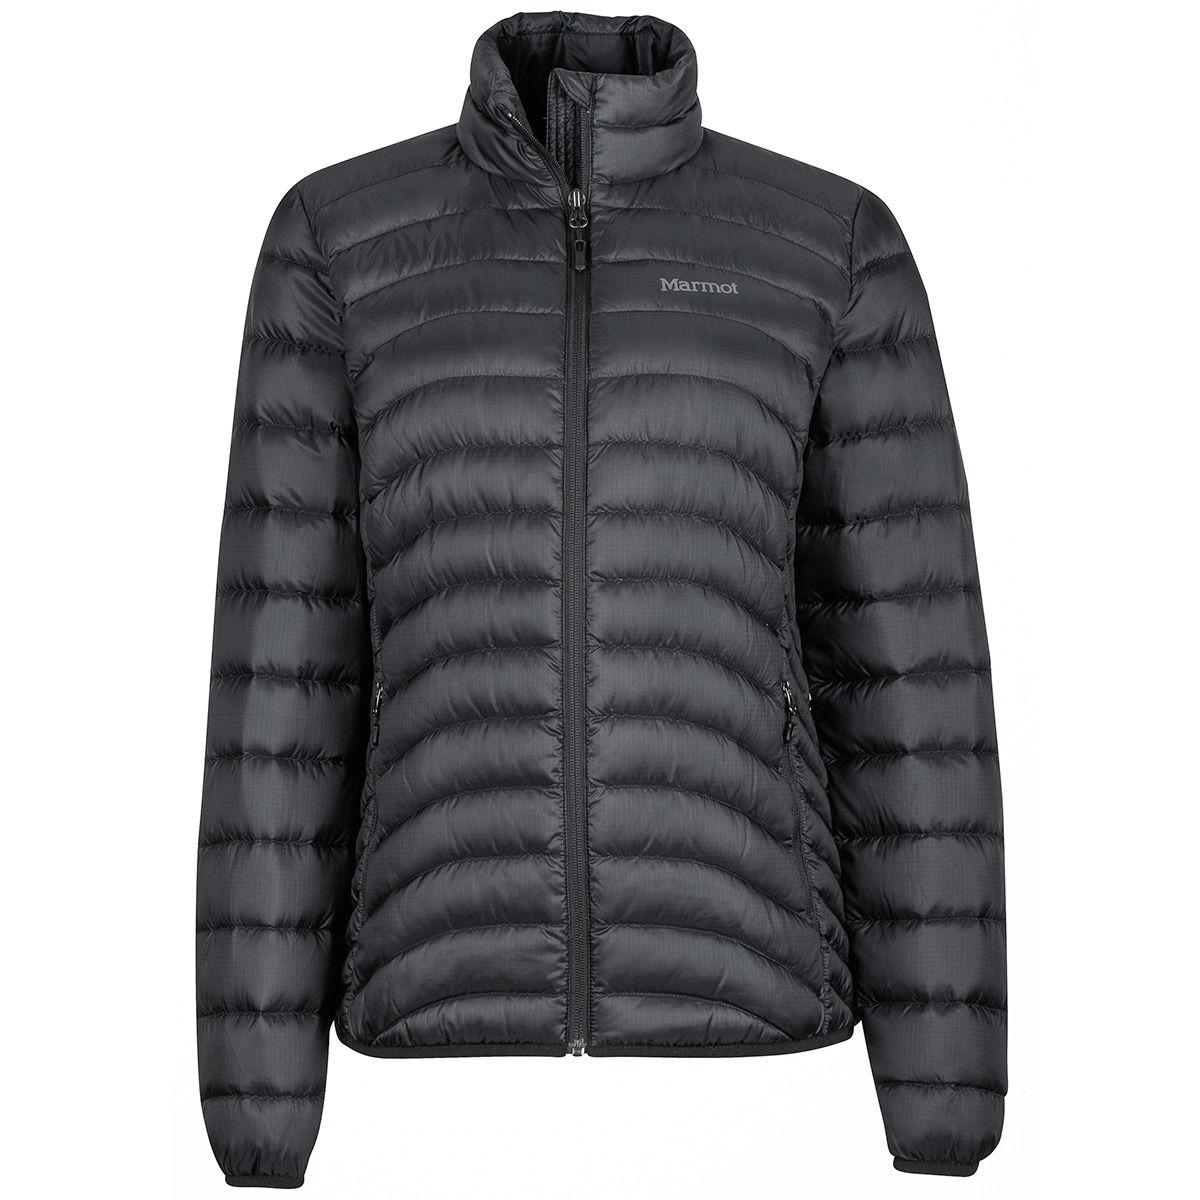 Marmot Aruna Jacket